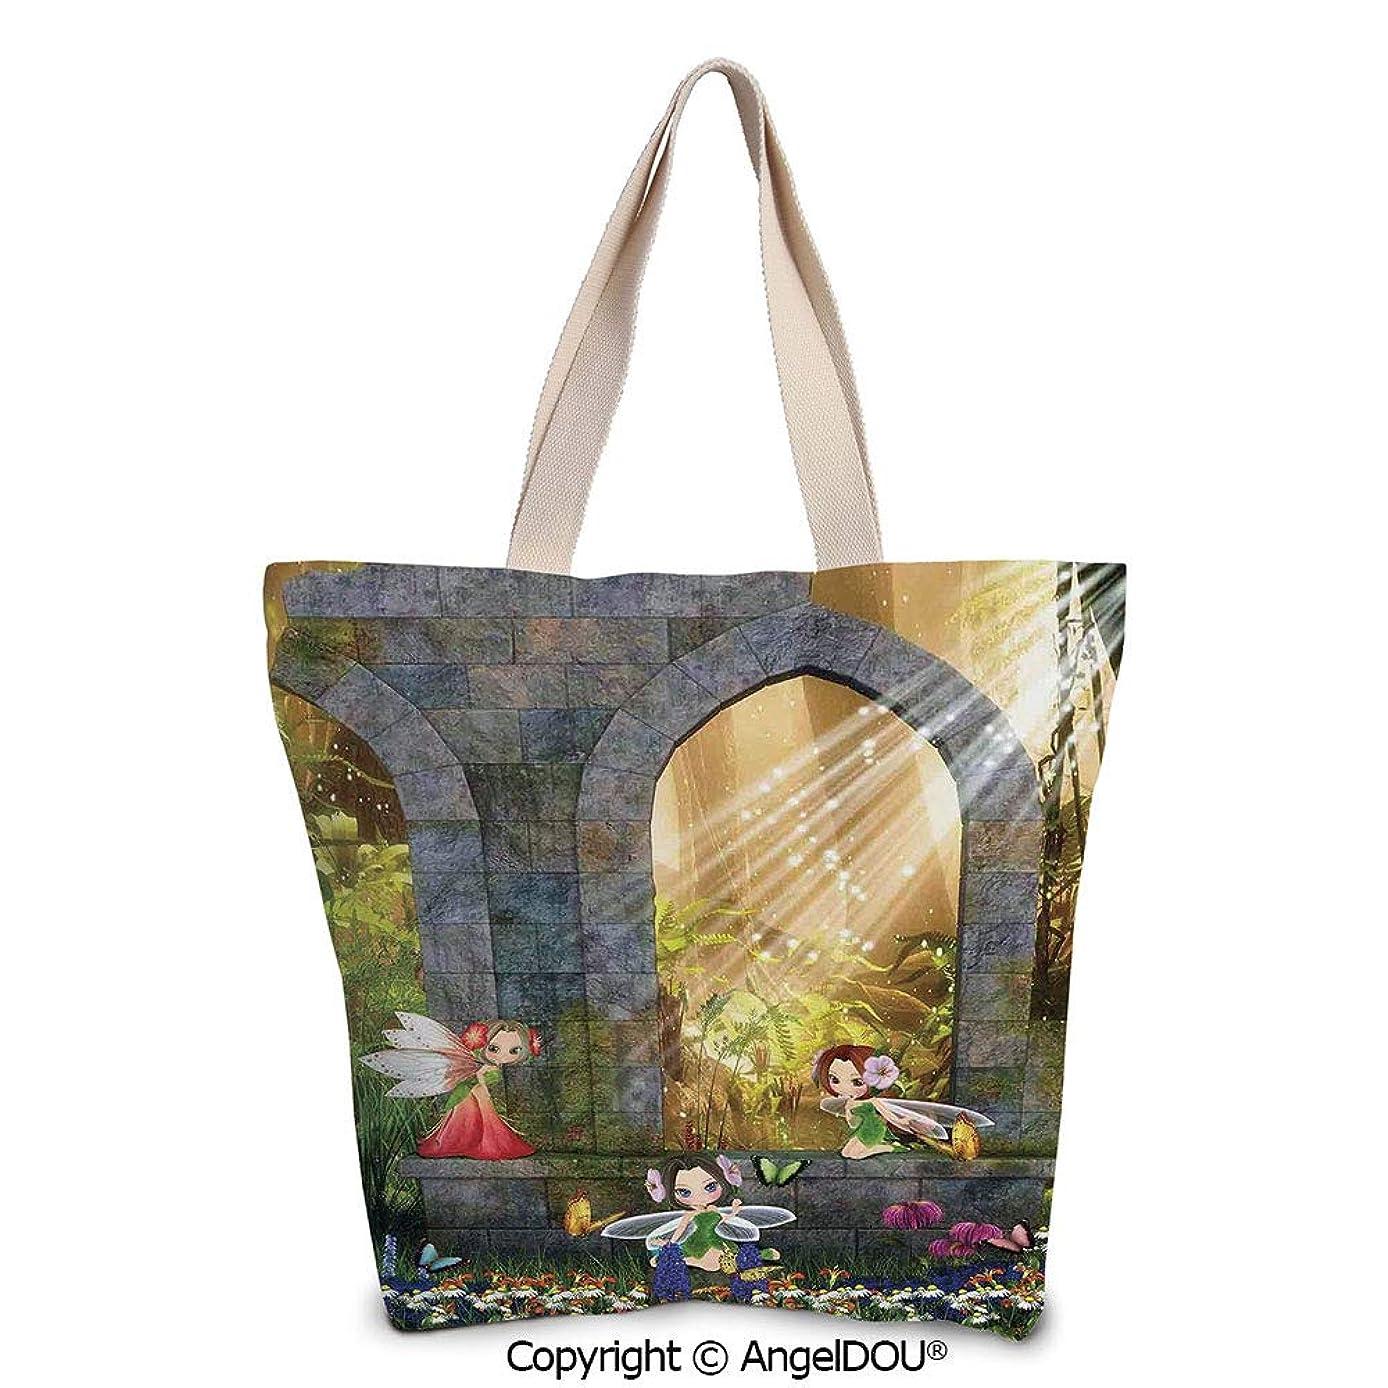 SCOXIXI Parrot Reusable Eco-friendly Shopping Shoulder bag Forest with Parrots